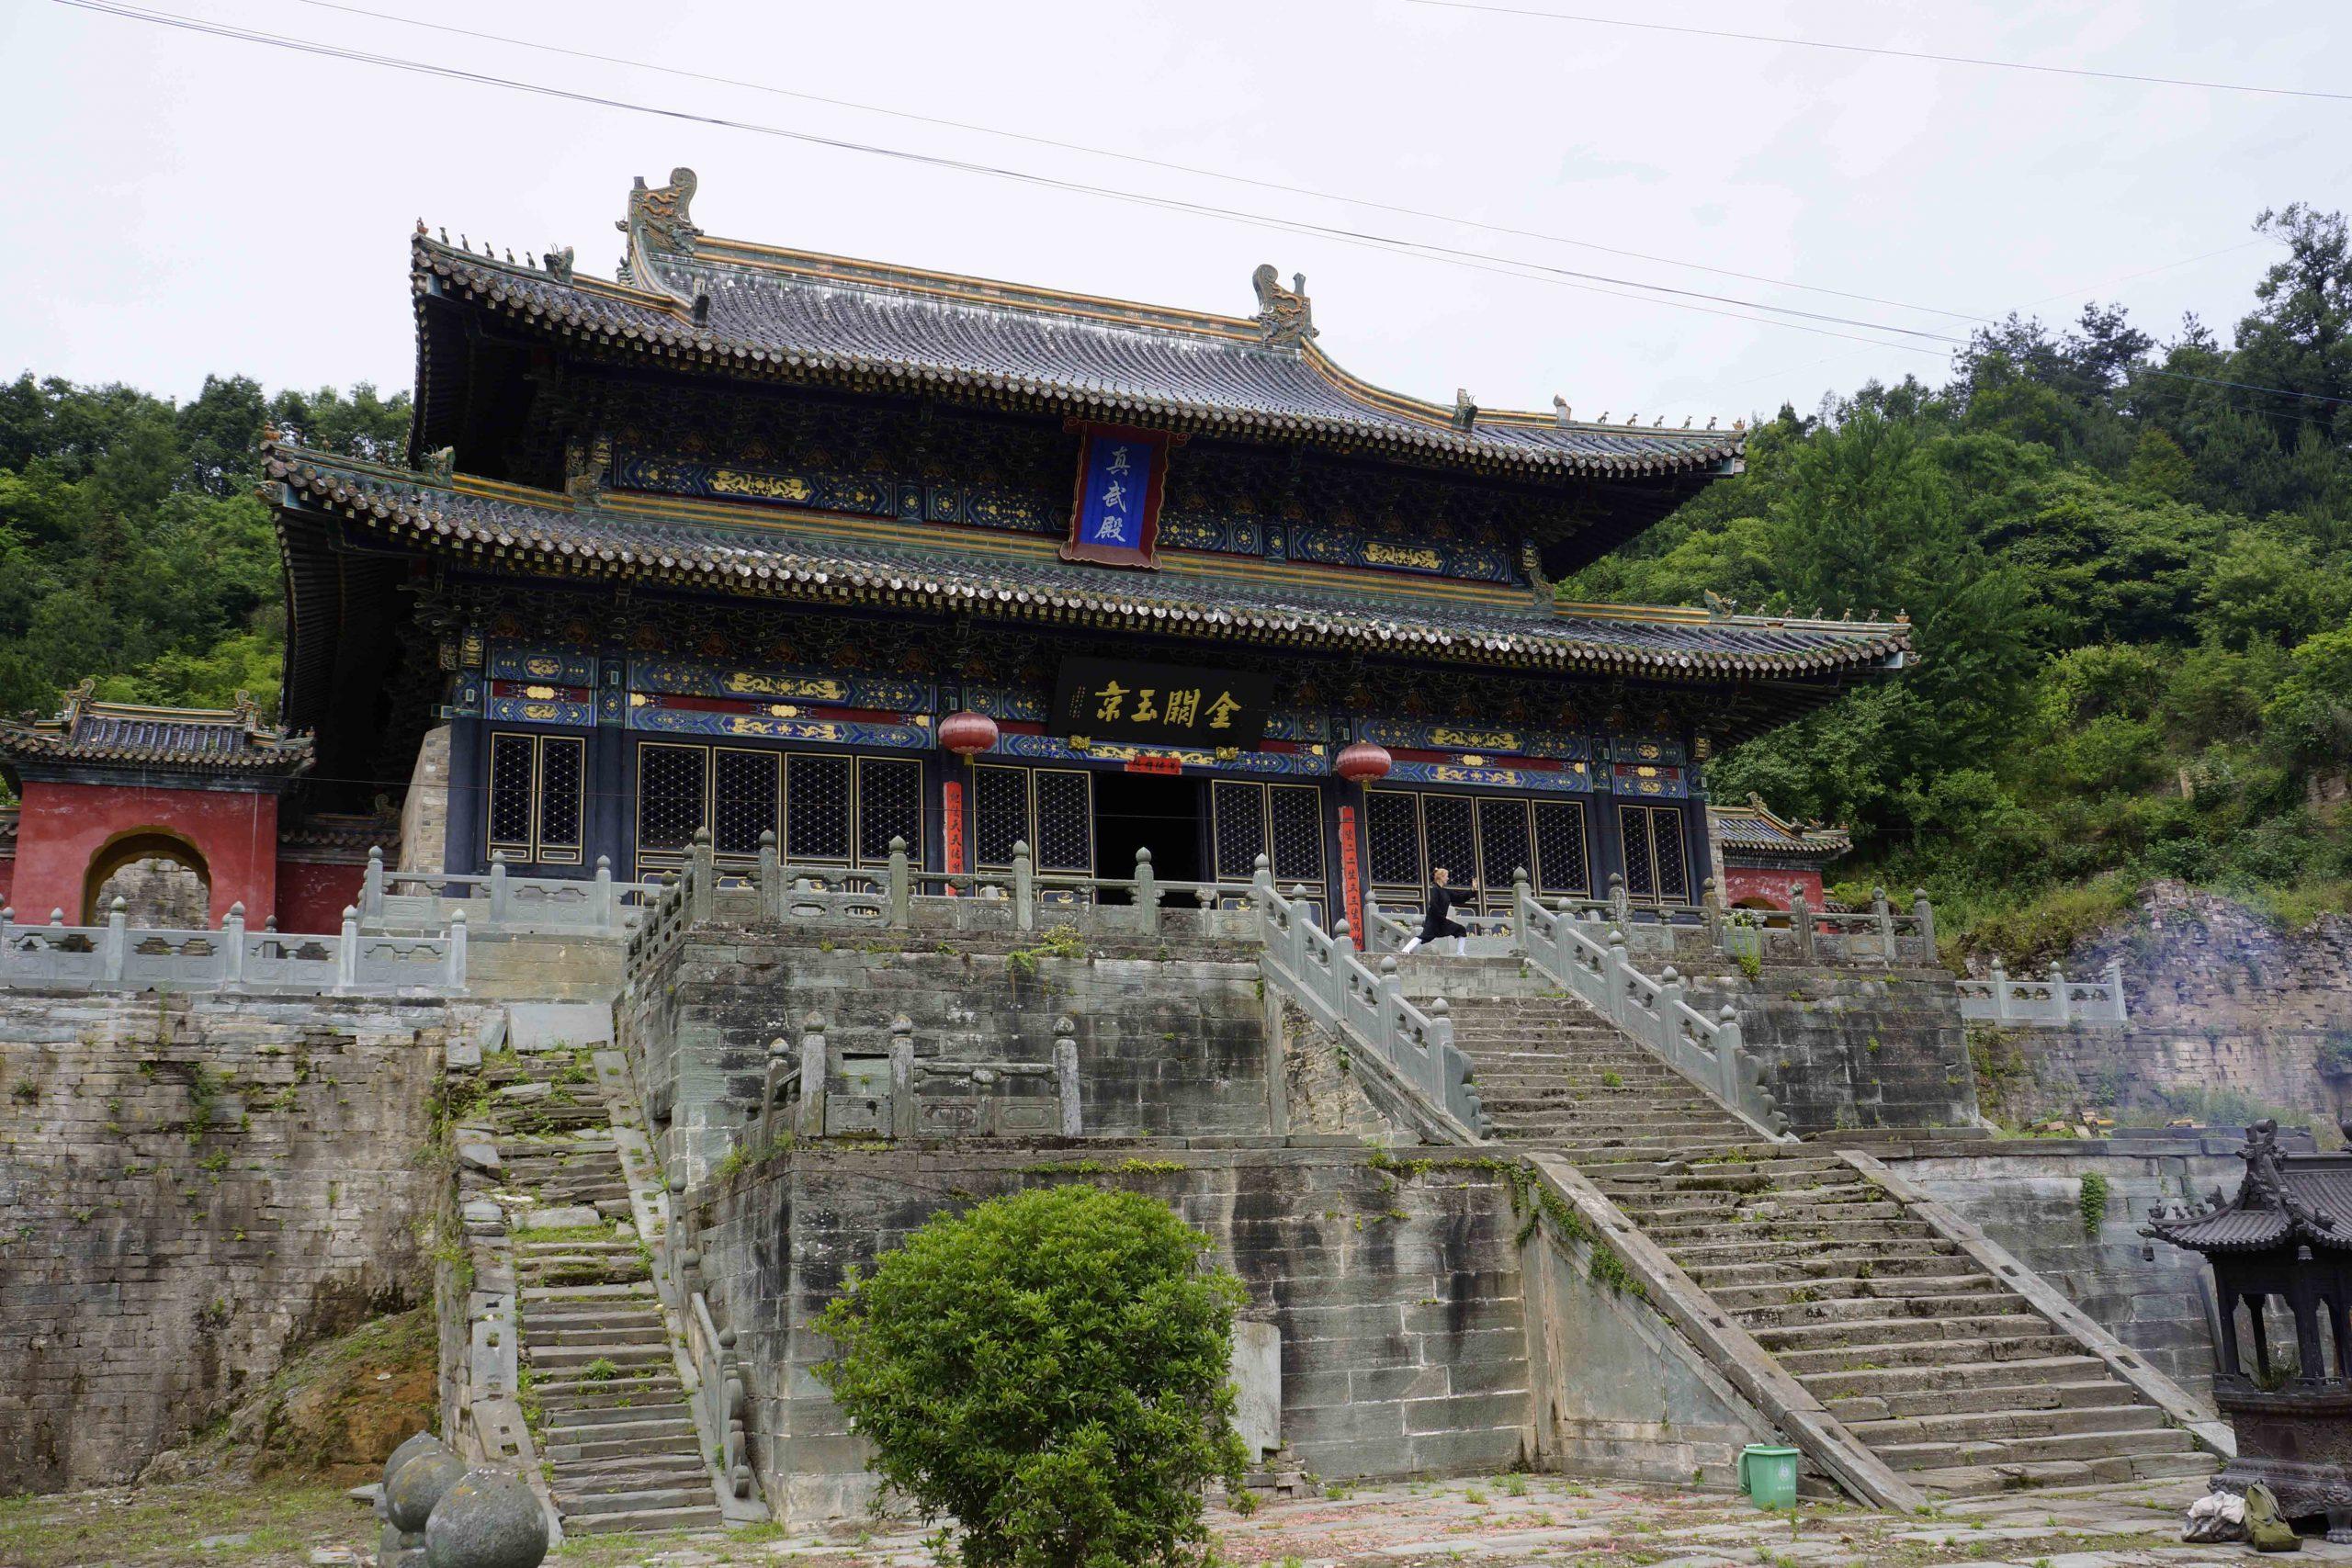 Wudang 5 Dragon Temple